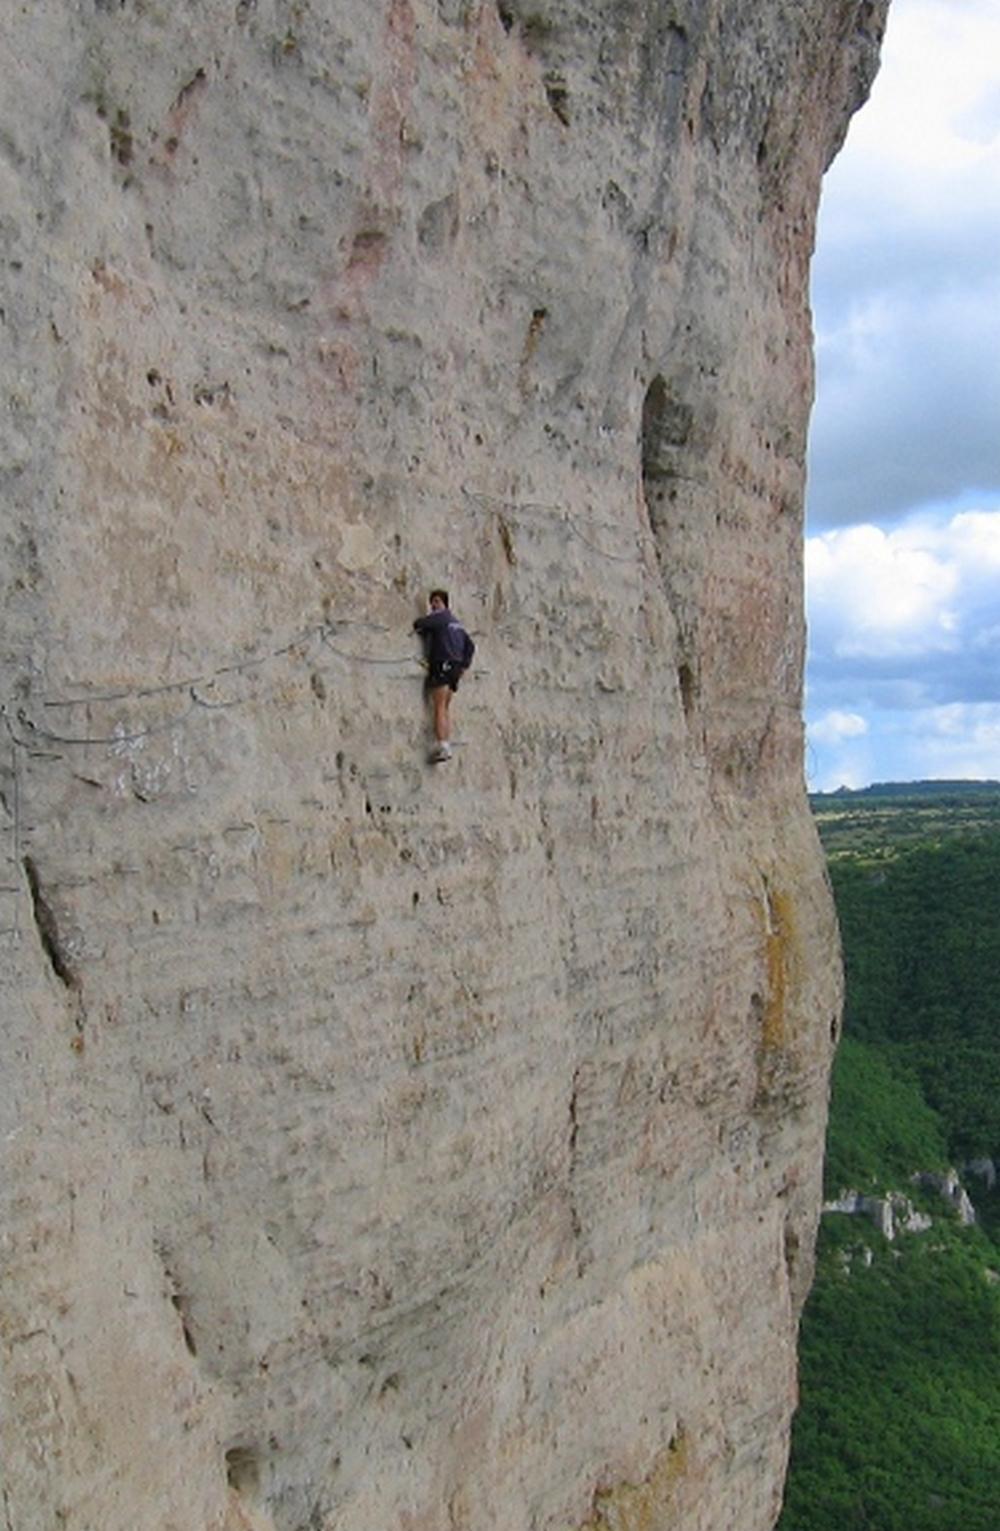 escalade montagne aventure TOULOUSE